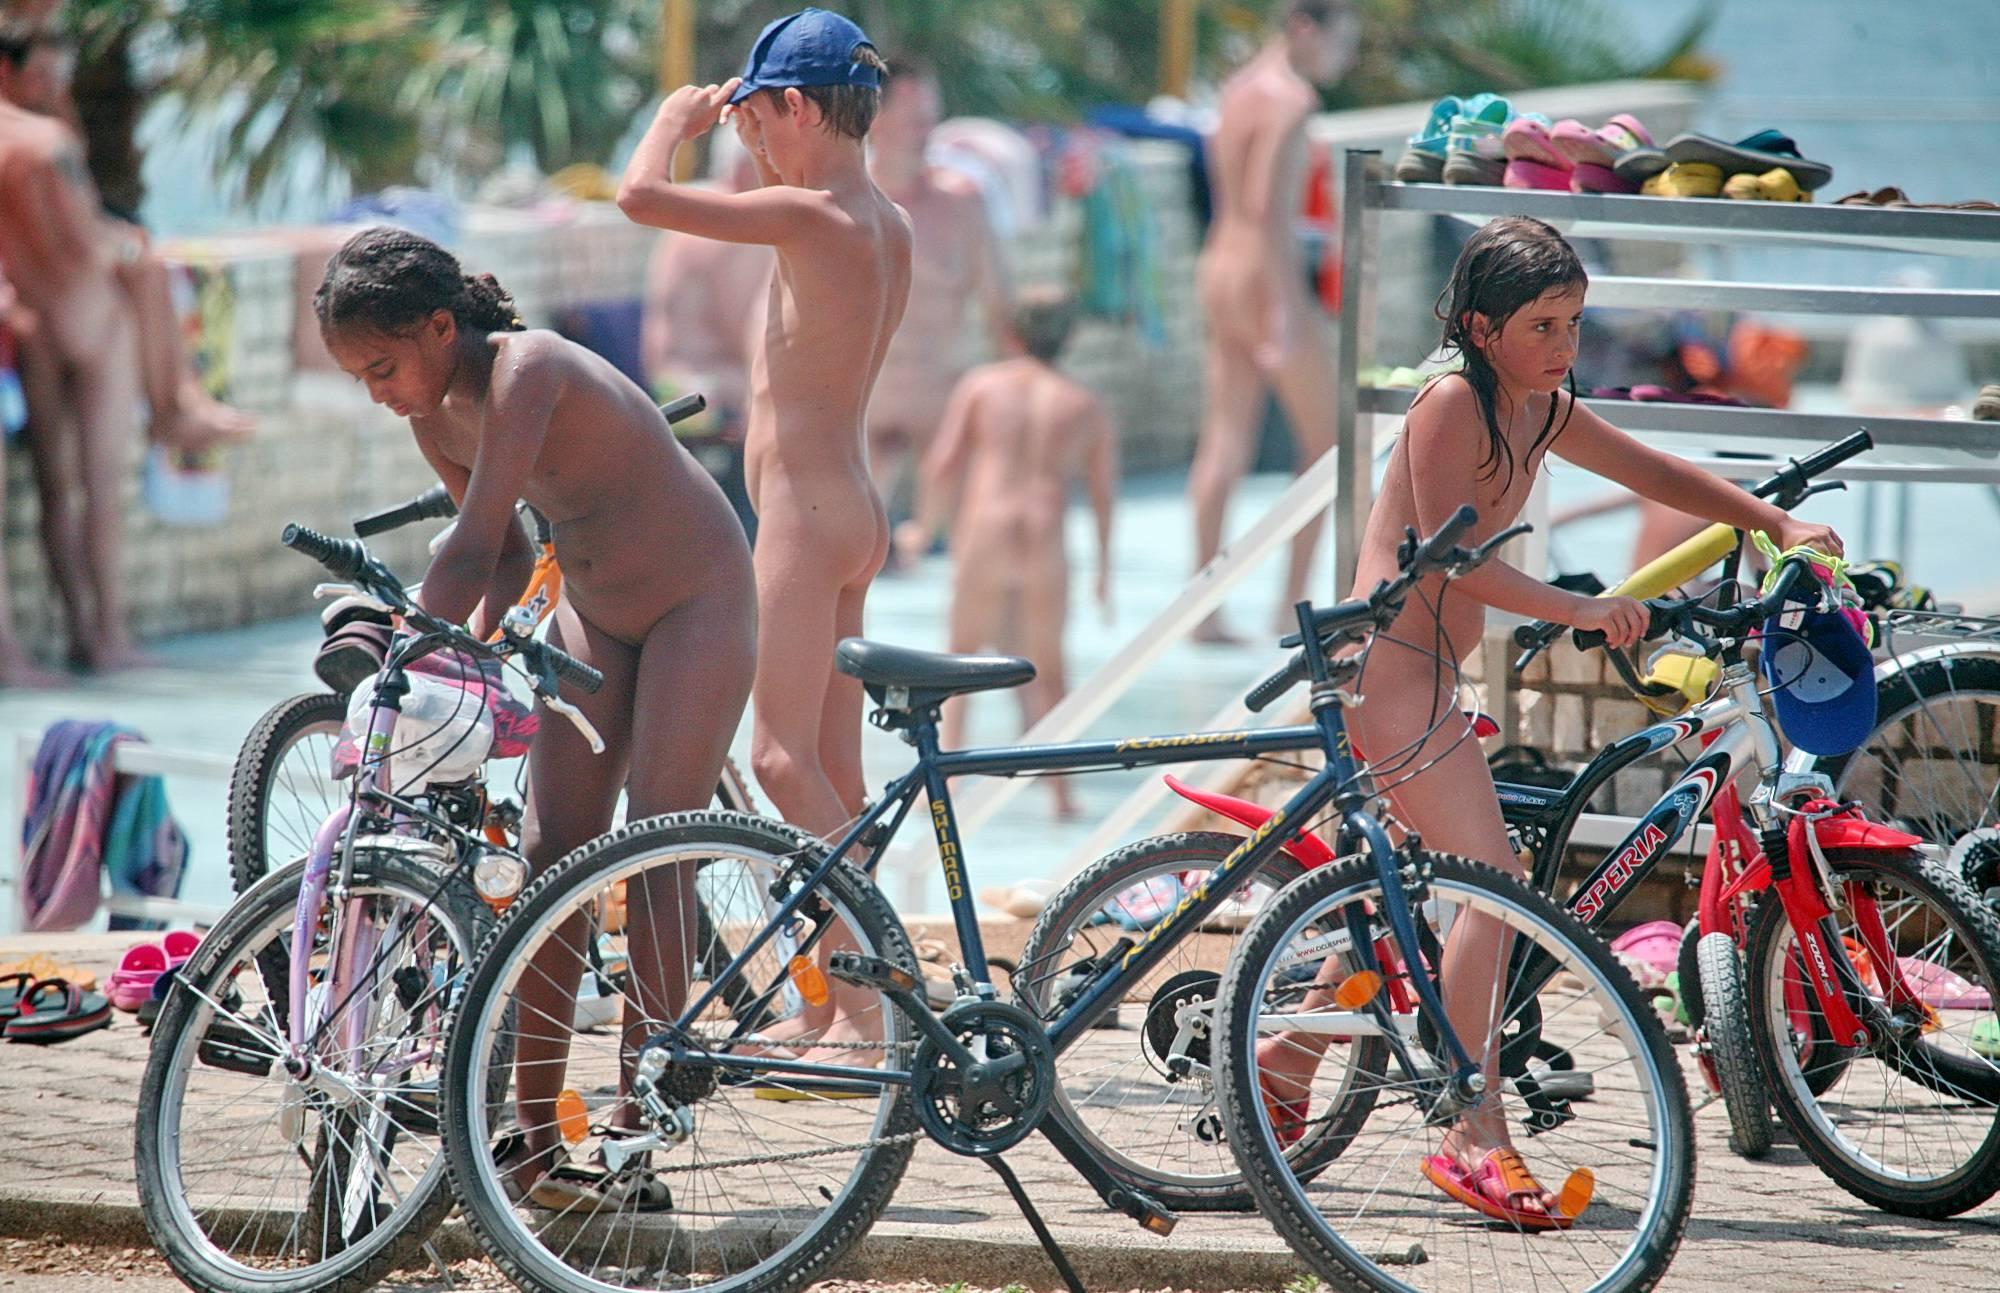 Purenudism Gallery Naturist Pool Bike Rack - 1